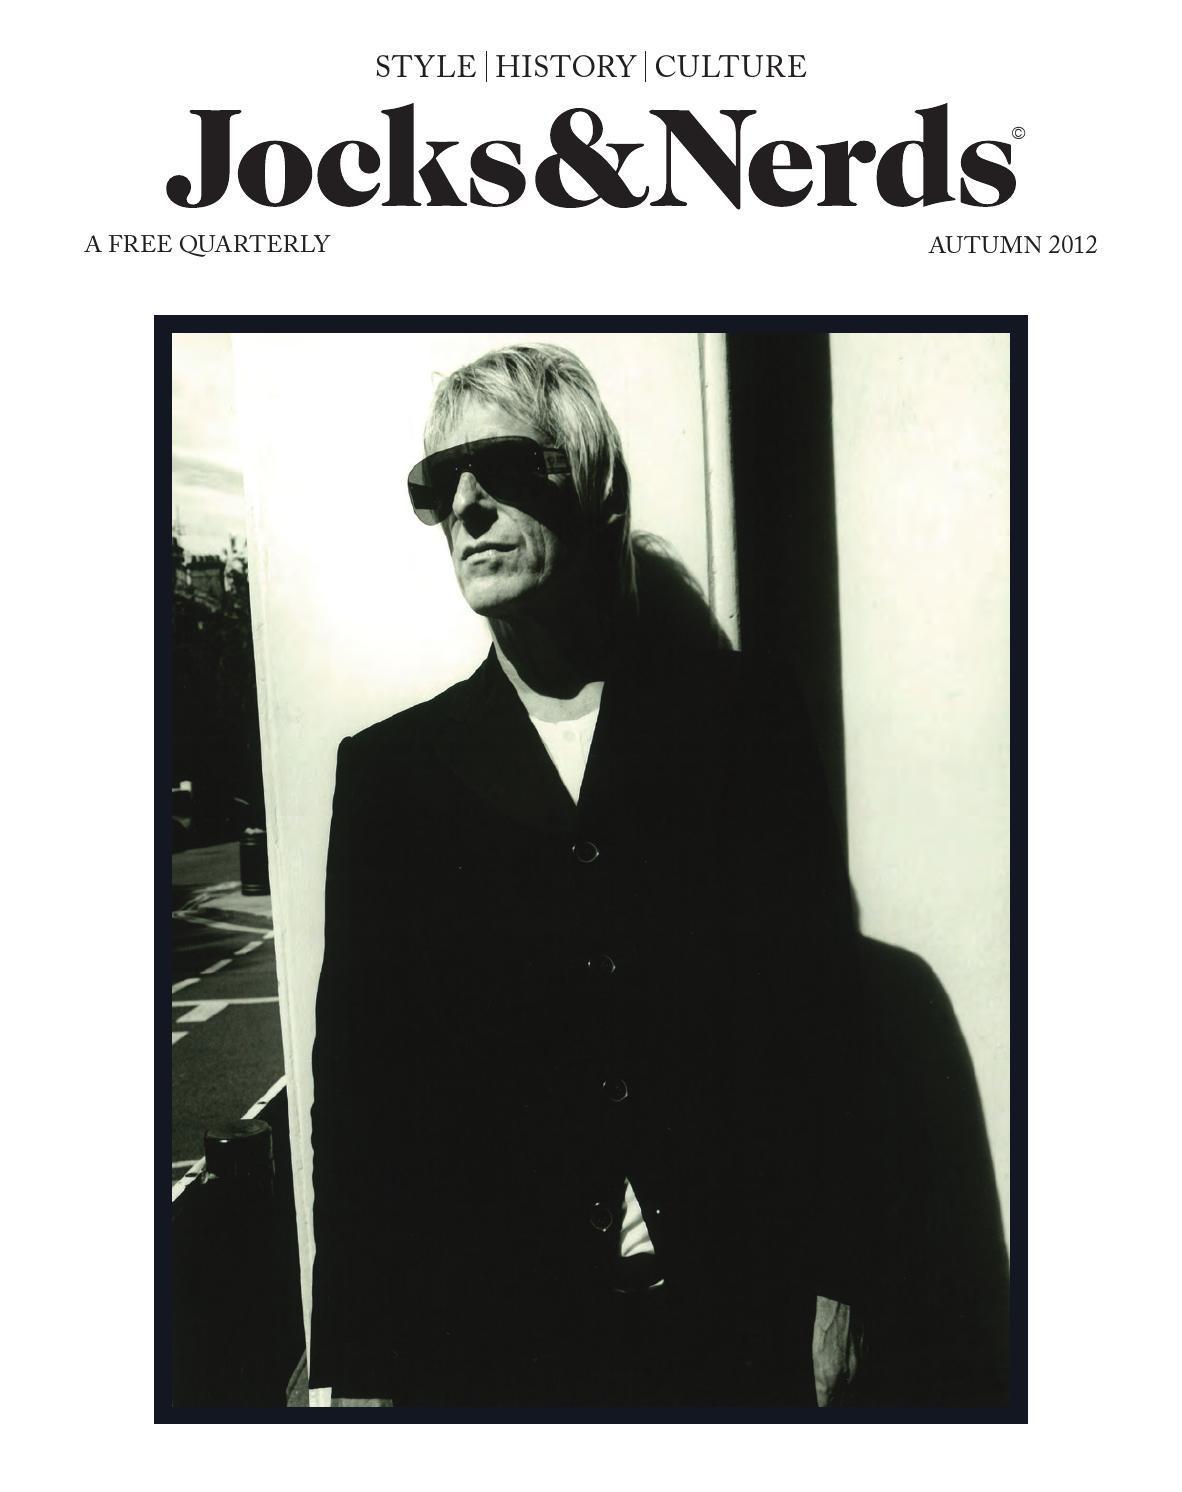 052afddfd Jocks&Nerds Issue 5, Autumn 2012 by Jocks&Nerds Magazine - issuu